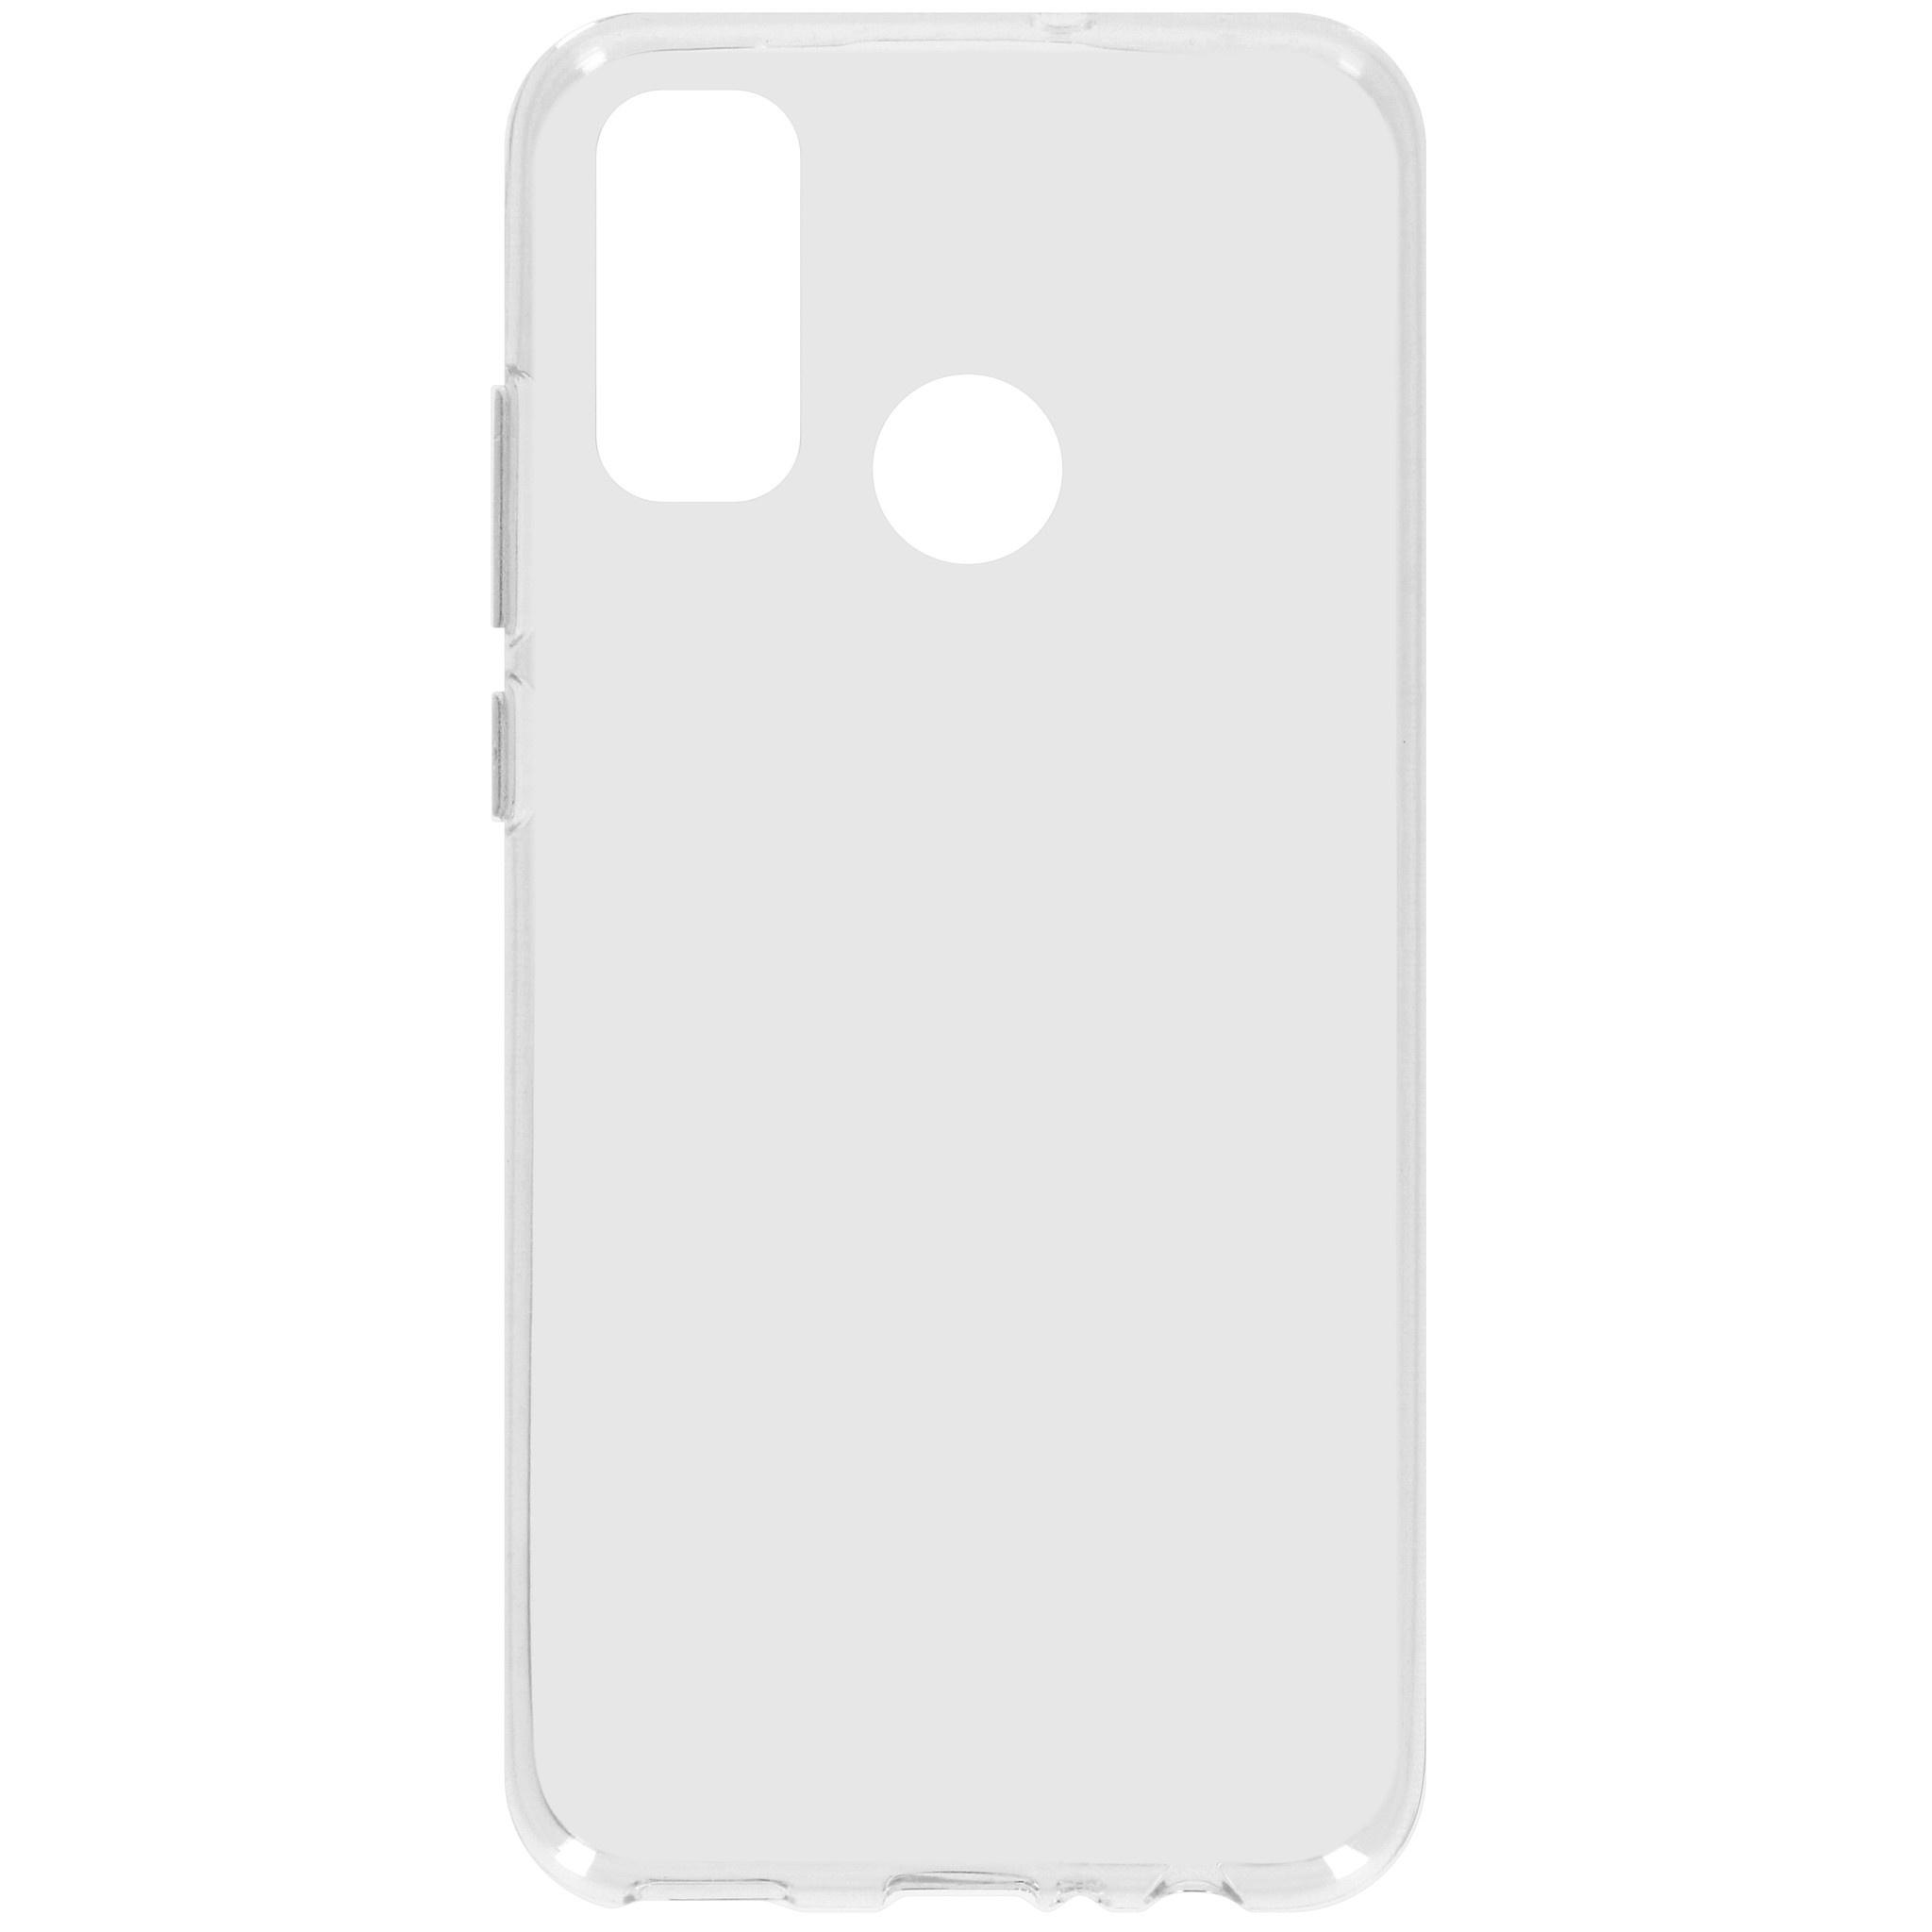 Coque silicone Huawei P Smart (2020) - Transparent